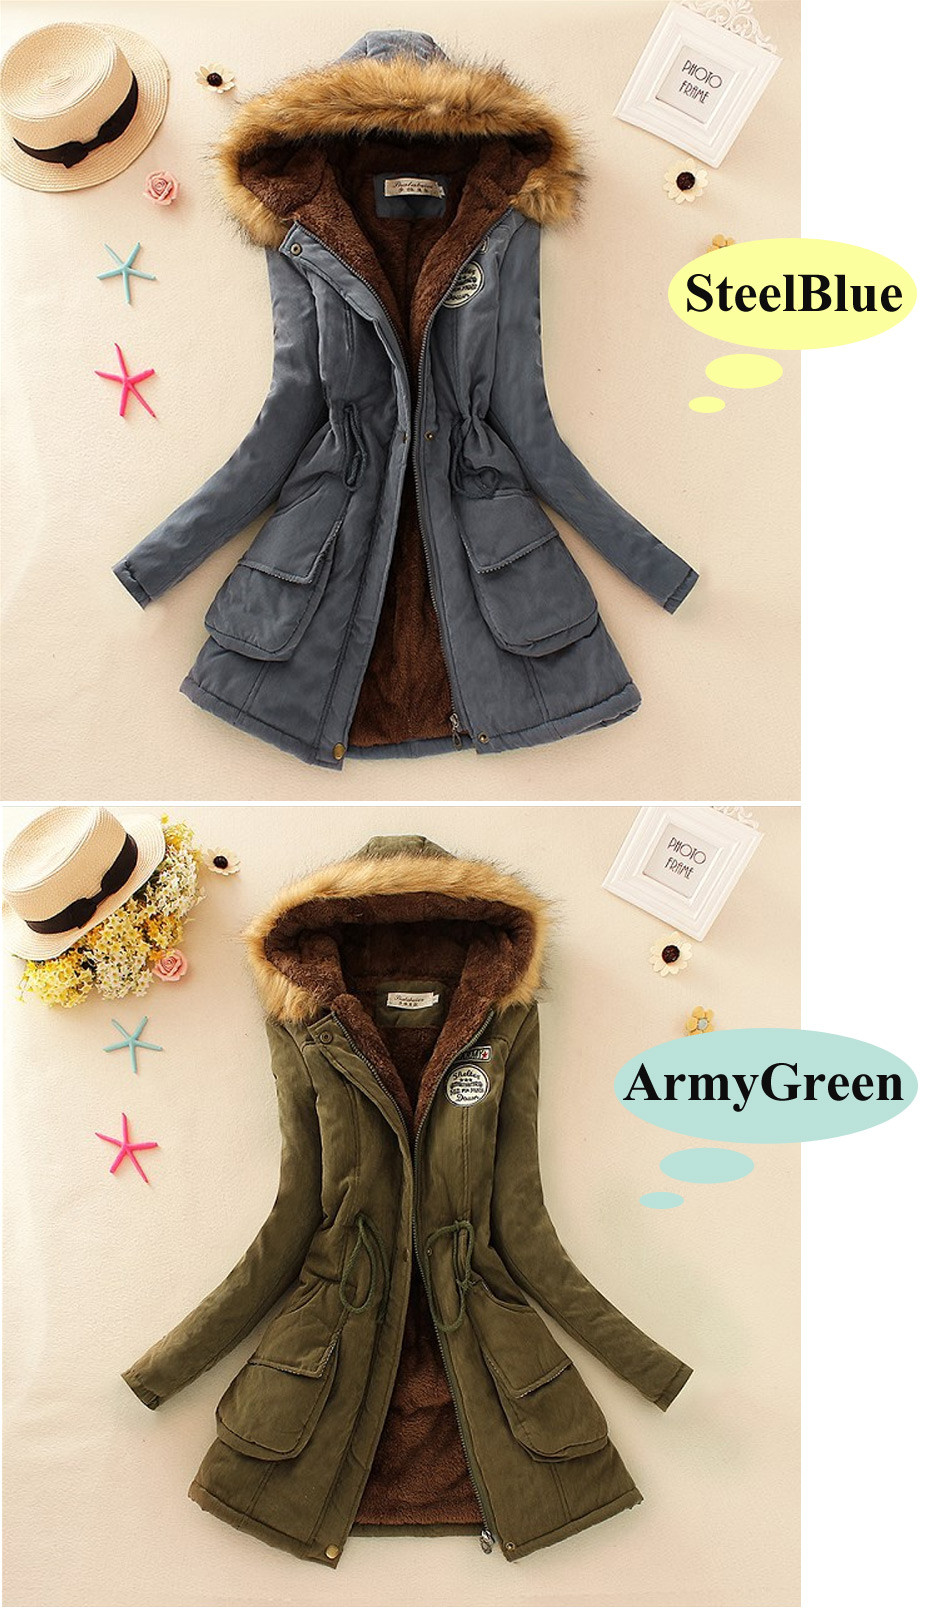 b4e8bdb3b2ac4 QIUXUAN Women Parka Fashion Autumn Winter Warm Jackets Women Fur Collar  Coats Long Parkas Hoodies Office Lady Cotton Plus Size